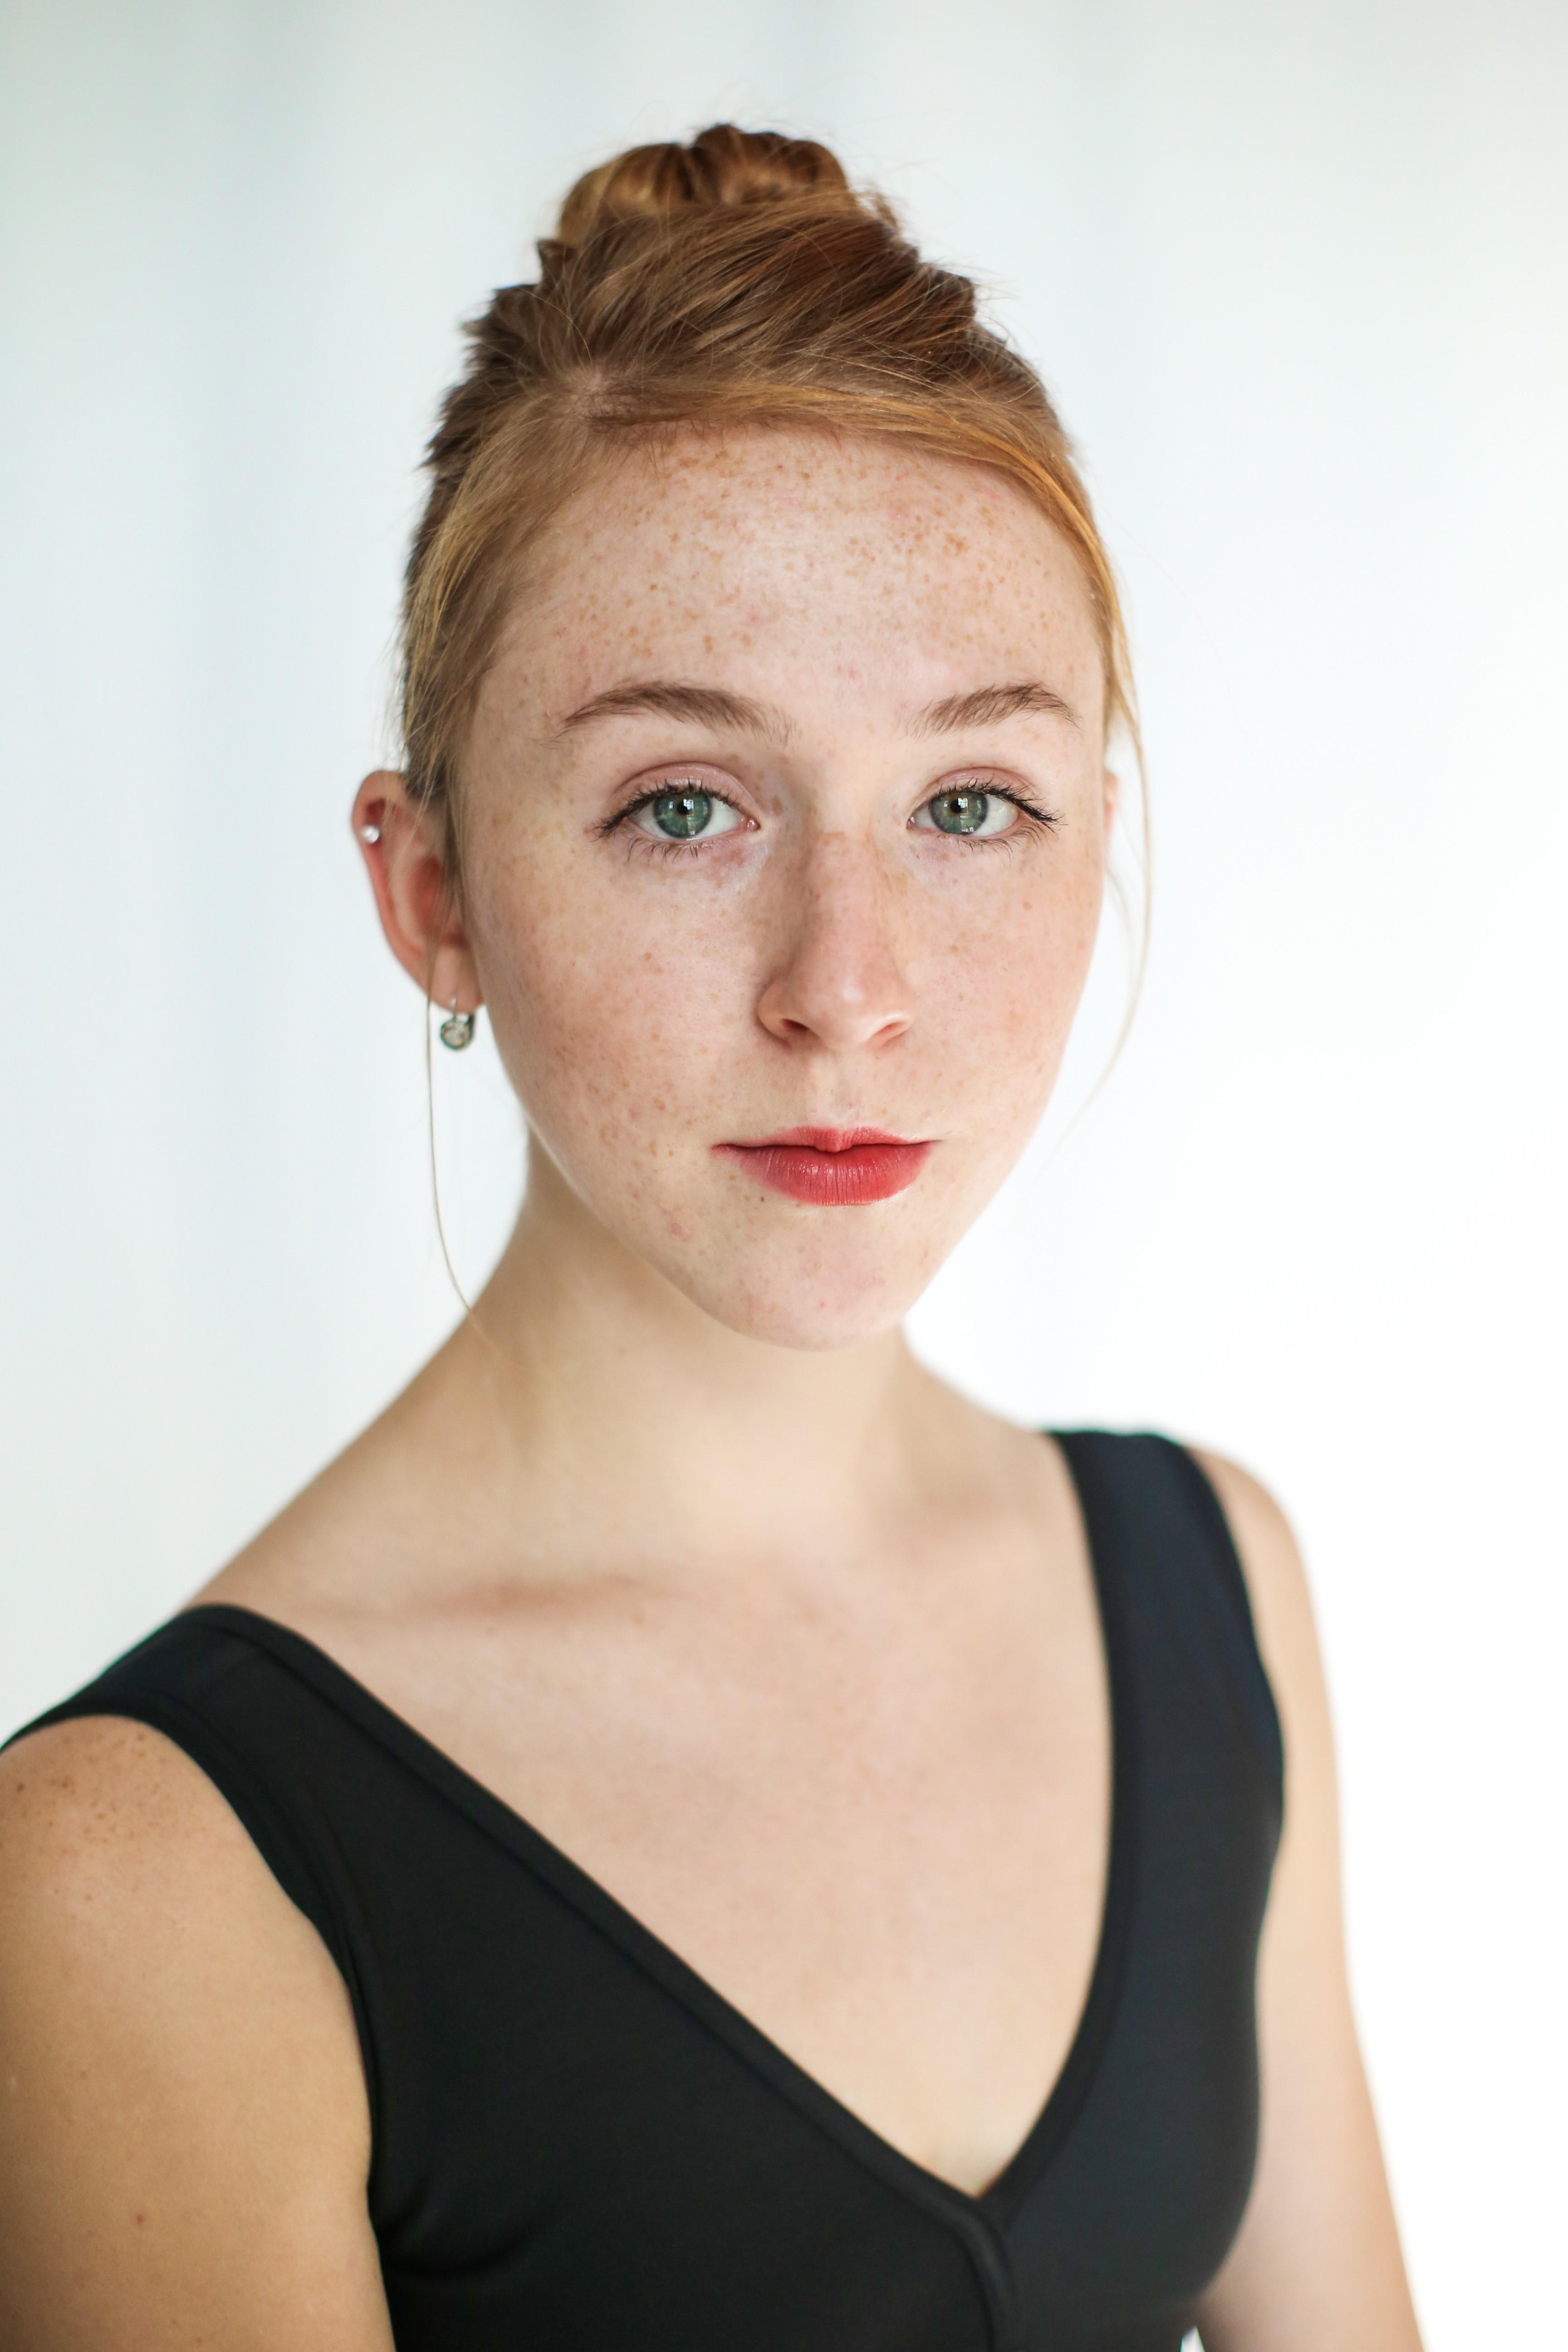 Amanda Evans